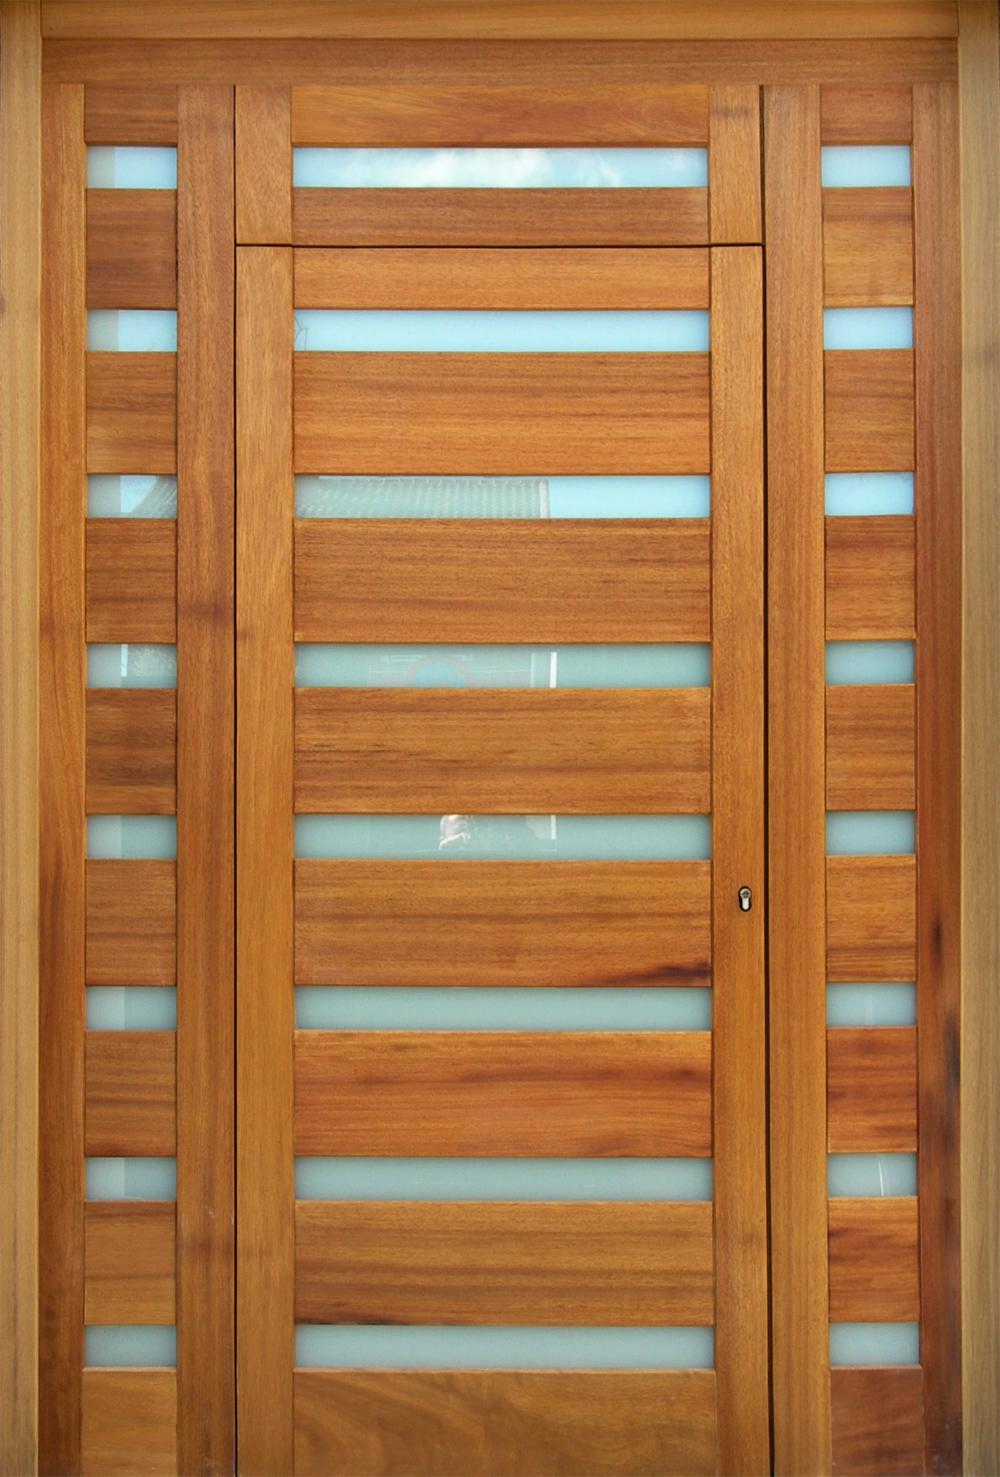 Puertas forjadas joyse puertas forjadas - Disenos puertas de madera exterior ...